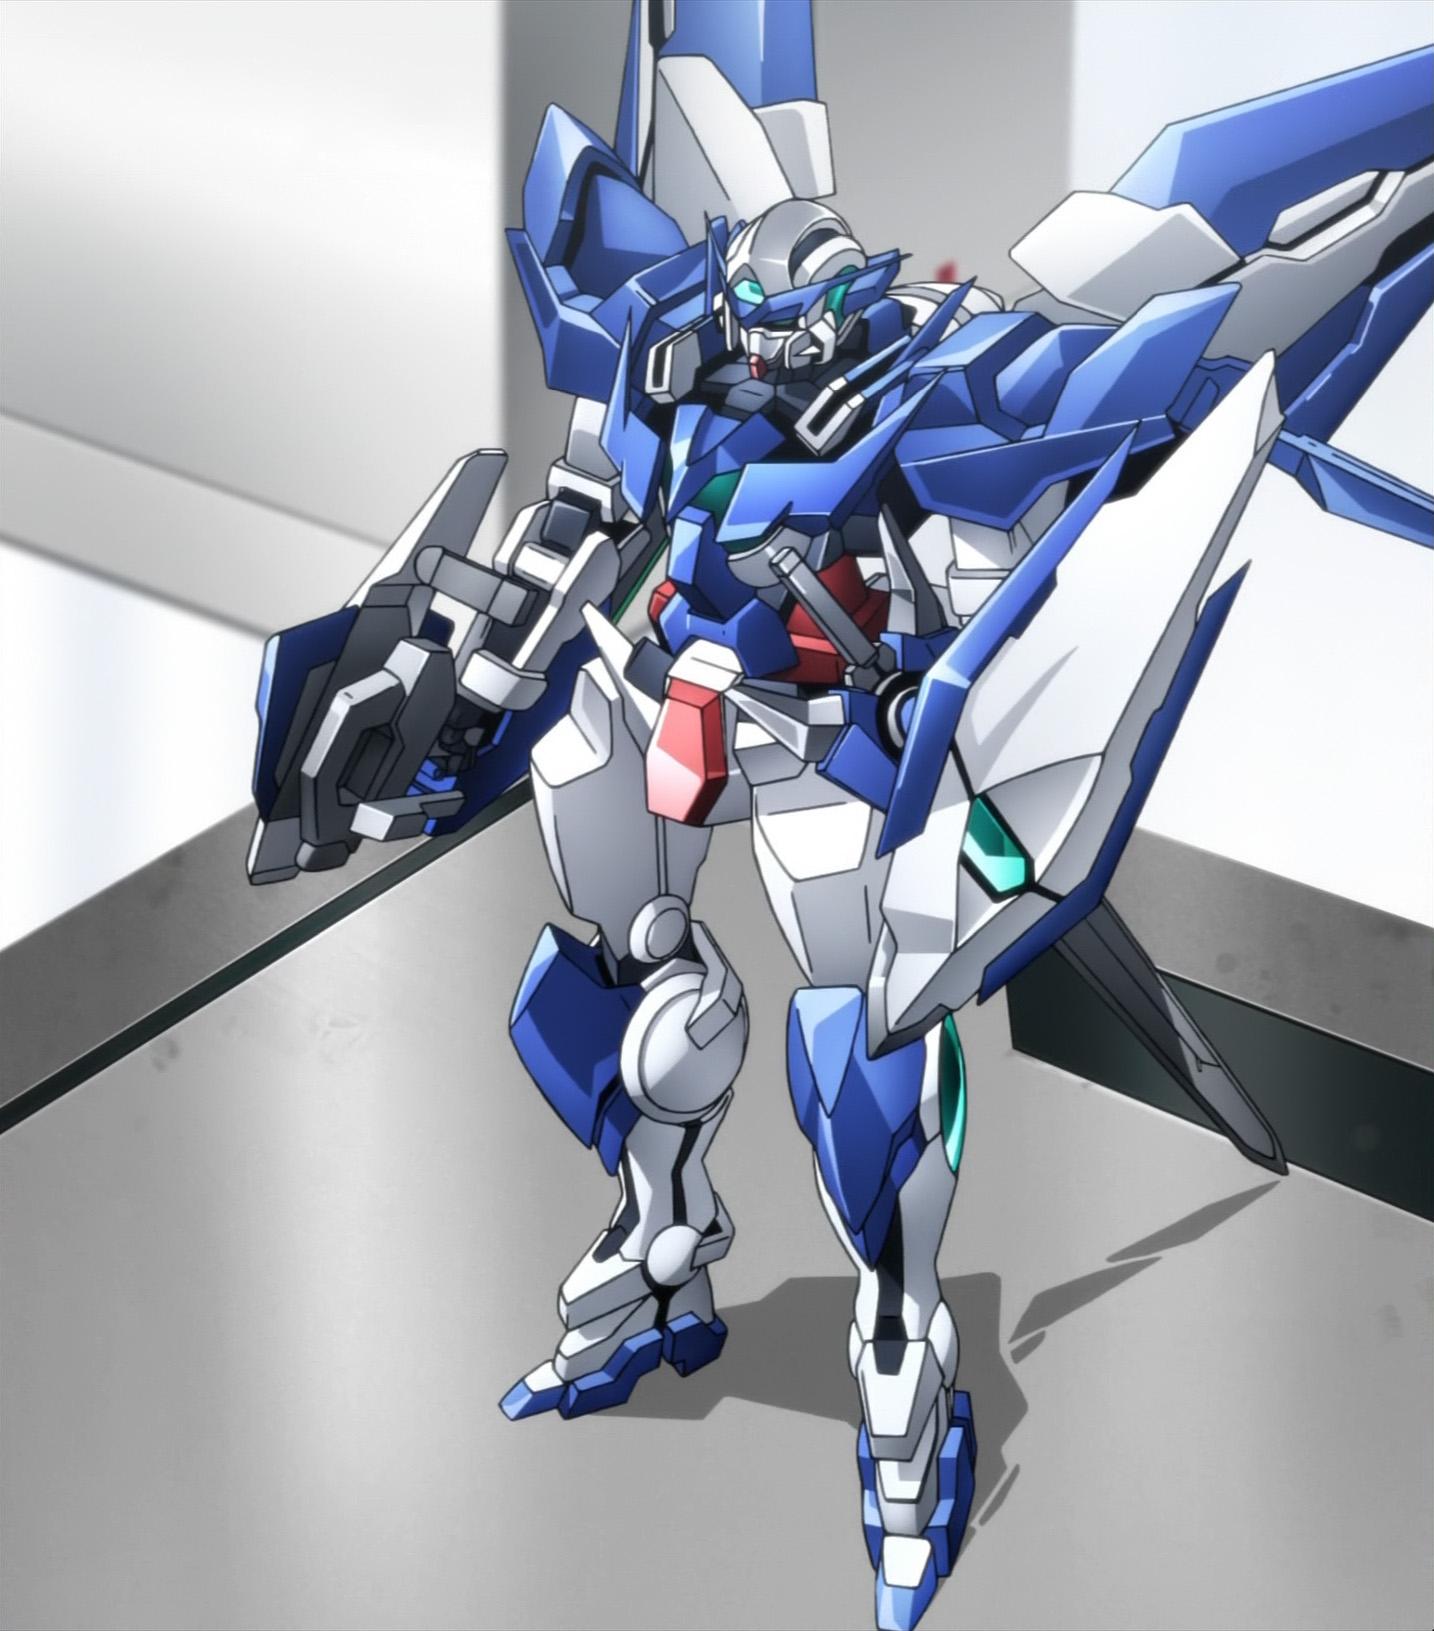 Gundam Family: MG 1/100 Gundam Amazing Exia Kai Custom Build  |Gundam Exia